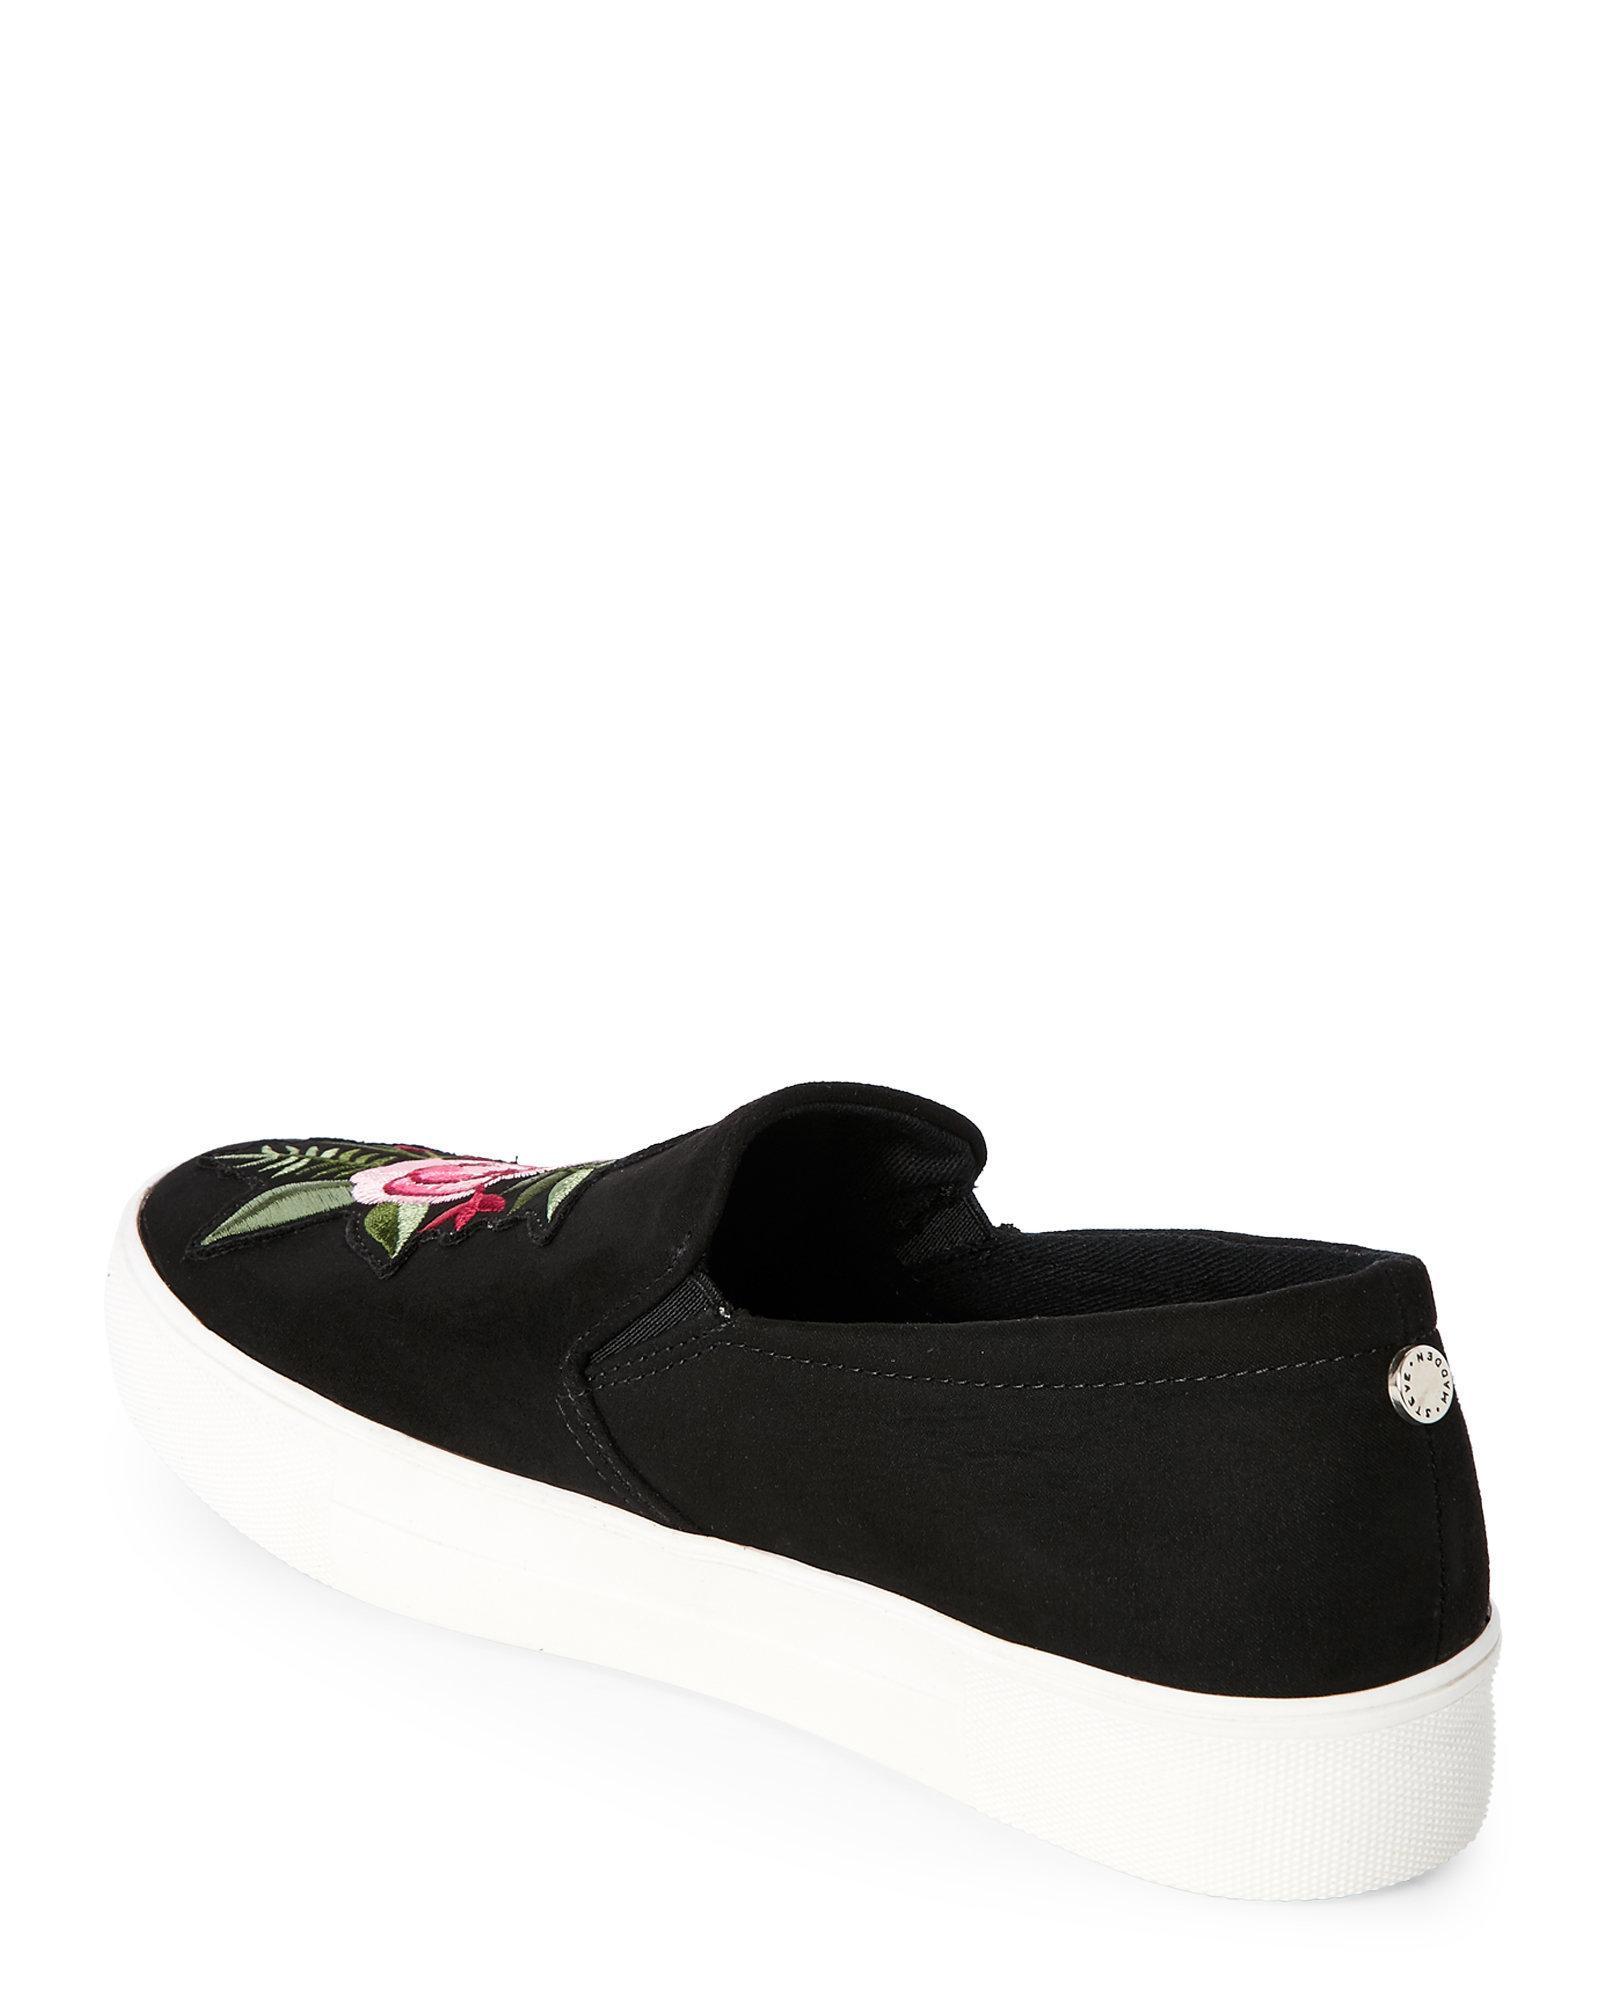 2d0bb076eed Lyst - Steve Madden Black Garcie Embroidered Platform Sneakers in Black